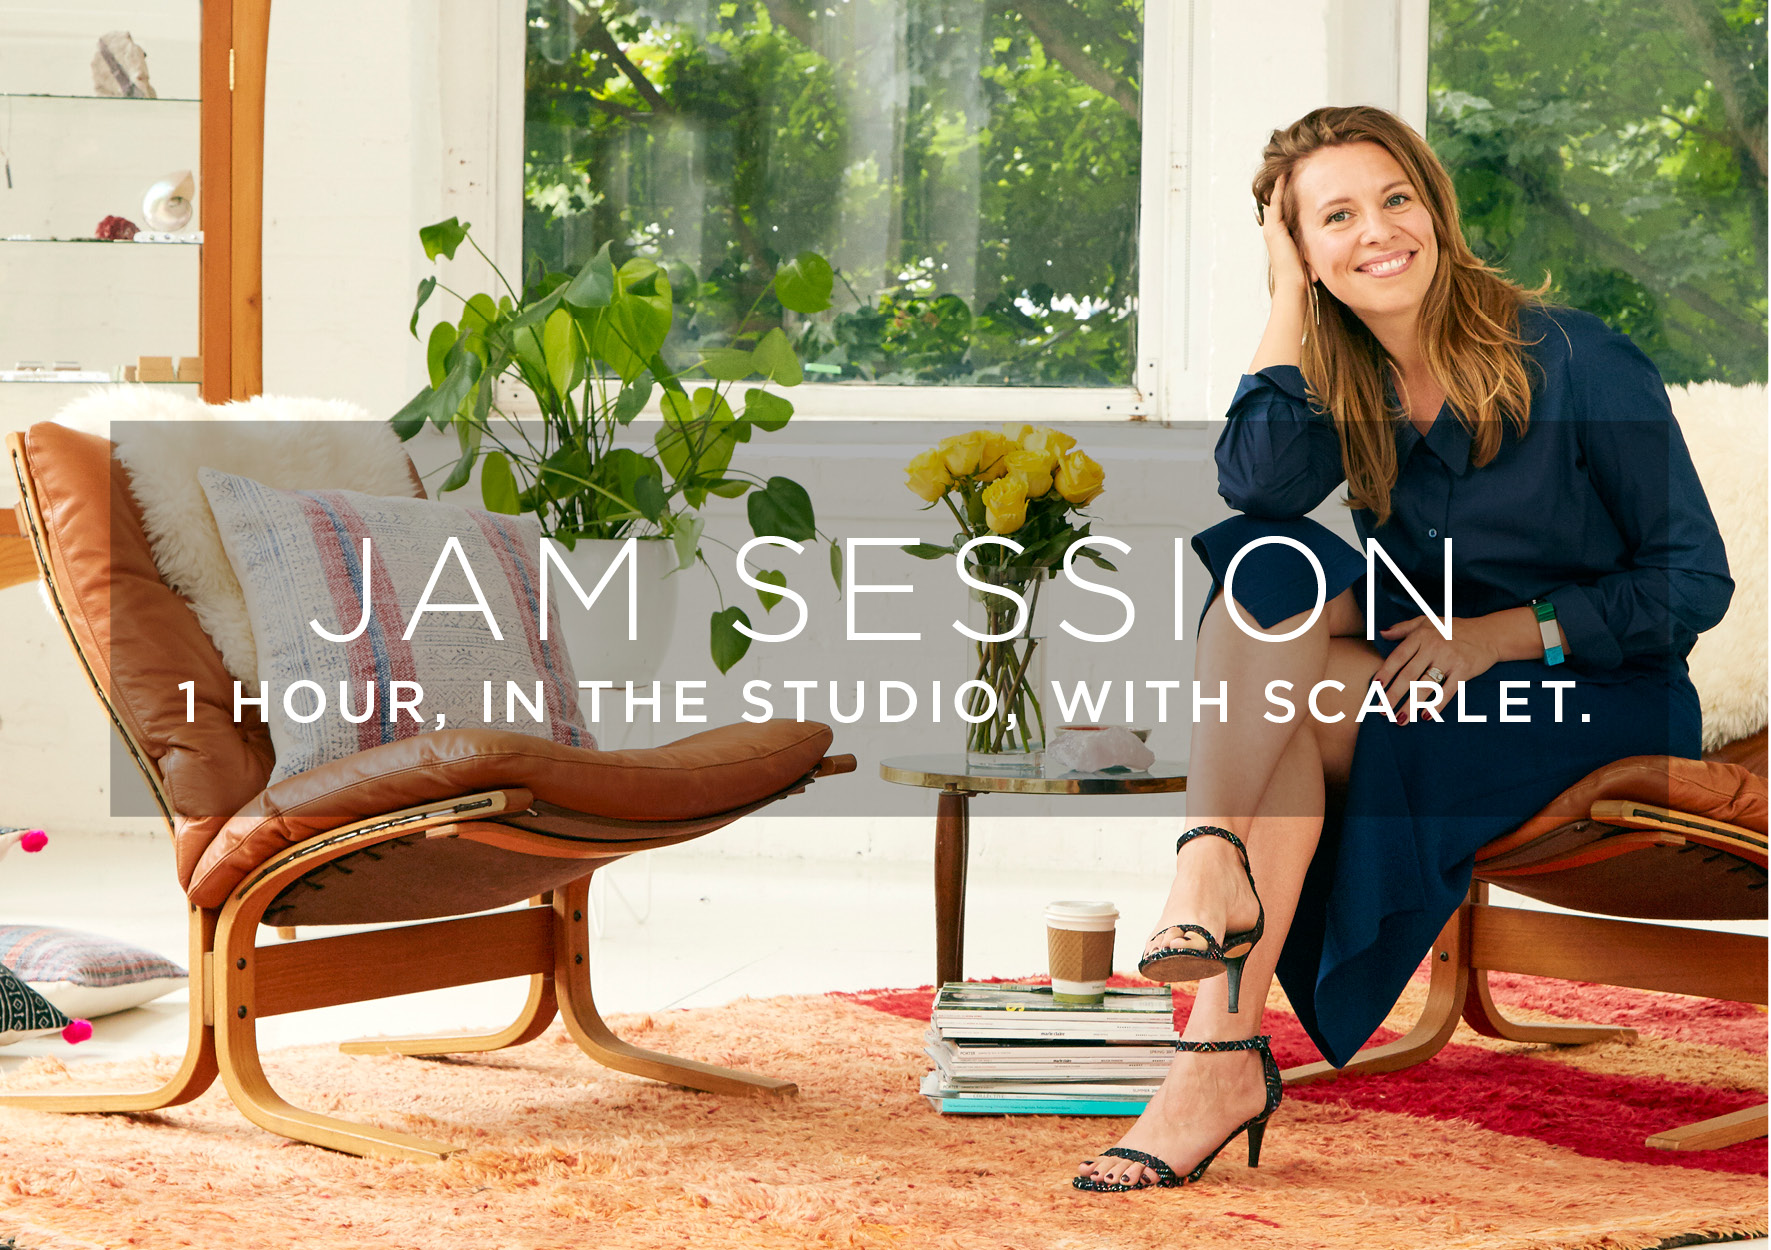 JAM SESSION HOME BADGE